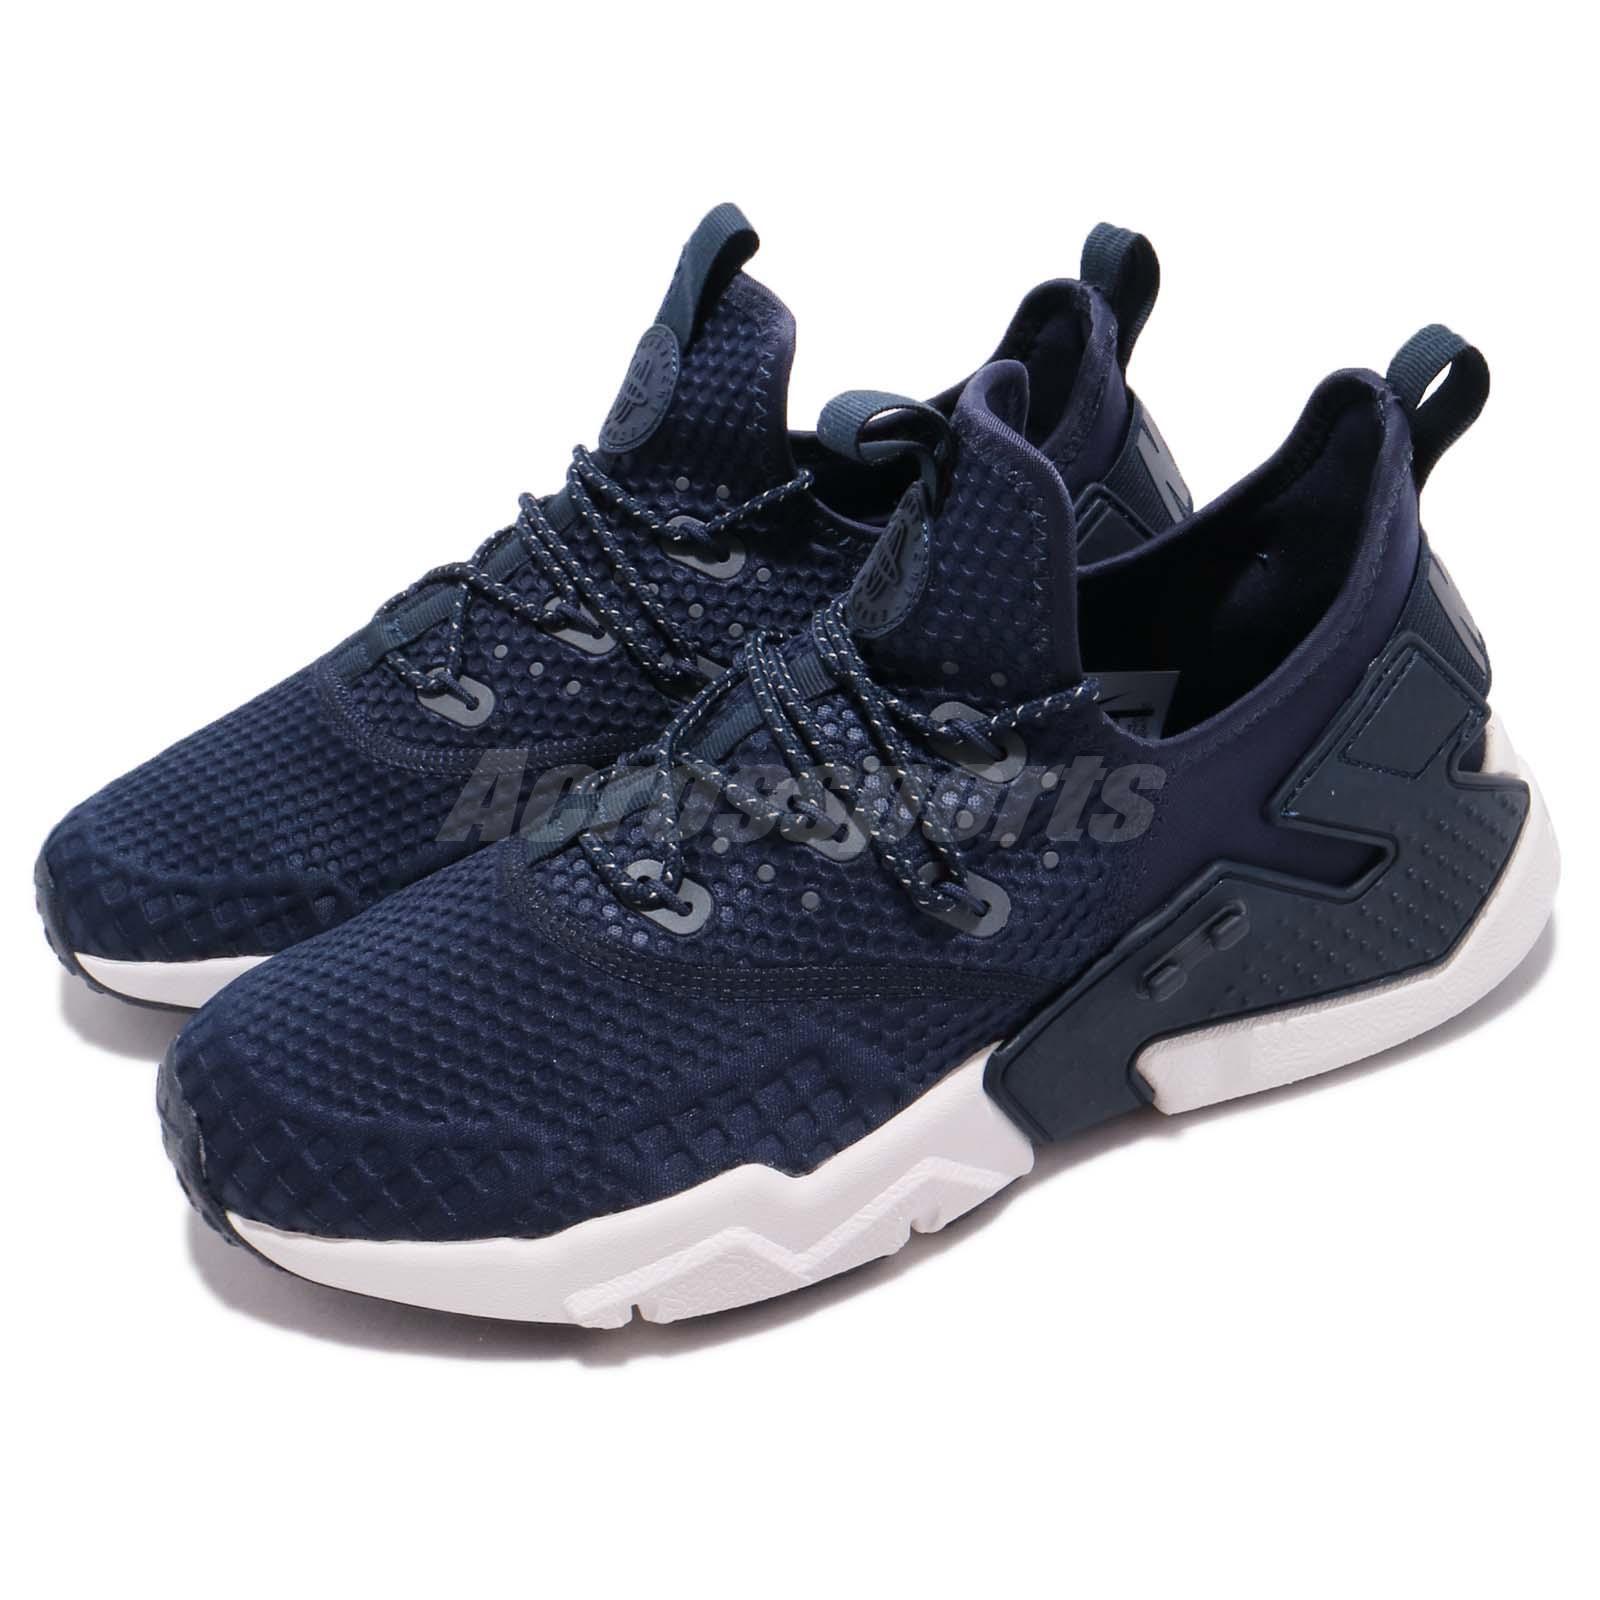 Nike Air Huarache Drift SE Navy White Men Running Casual shoes Sneaker AO1731-401